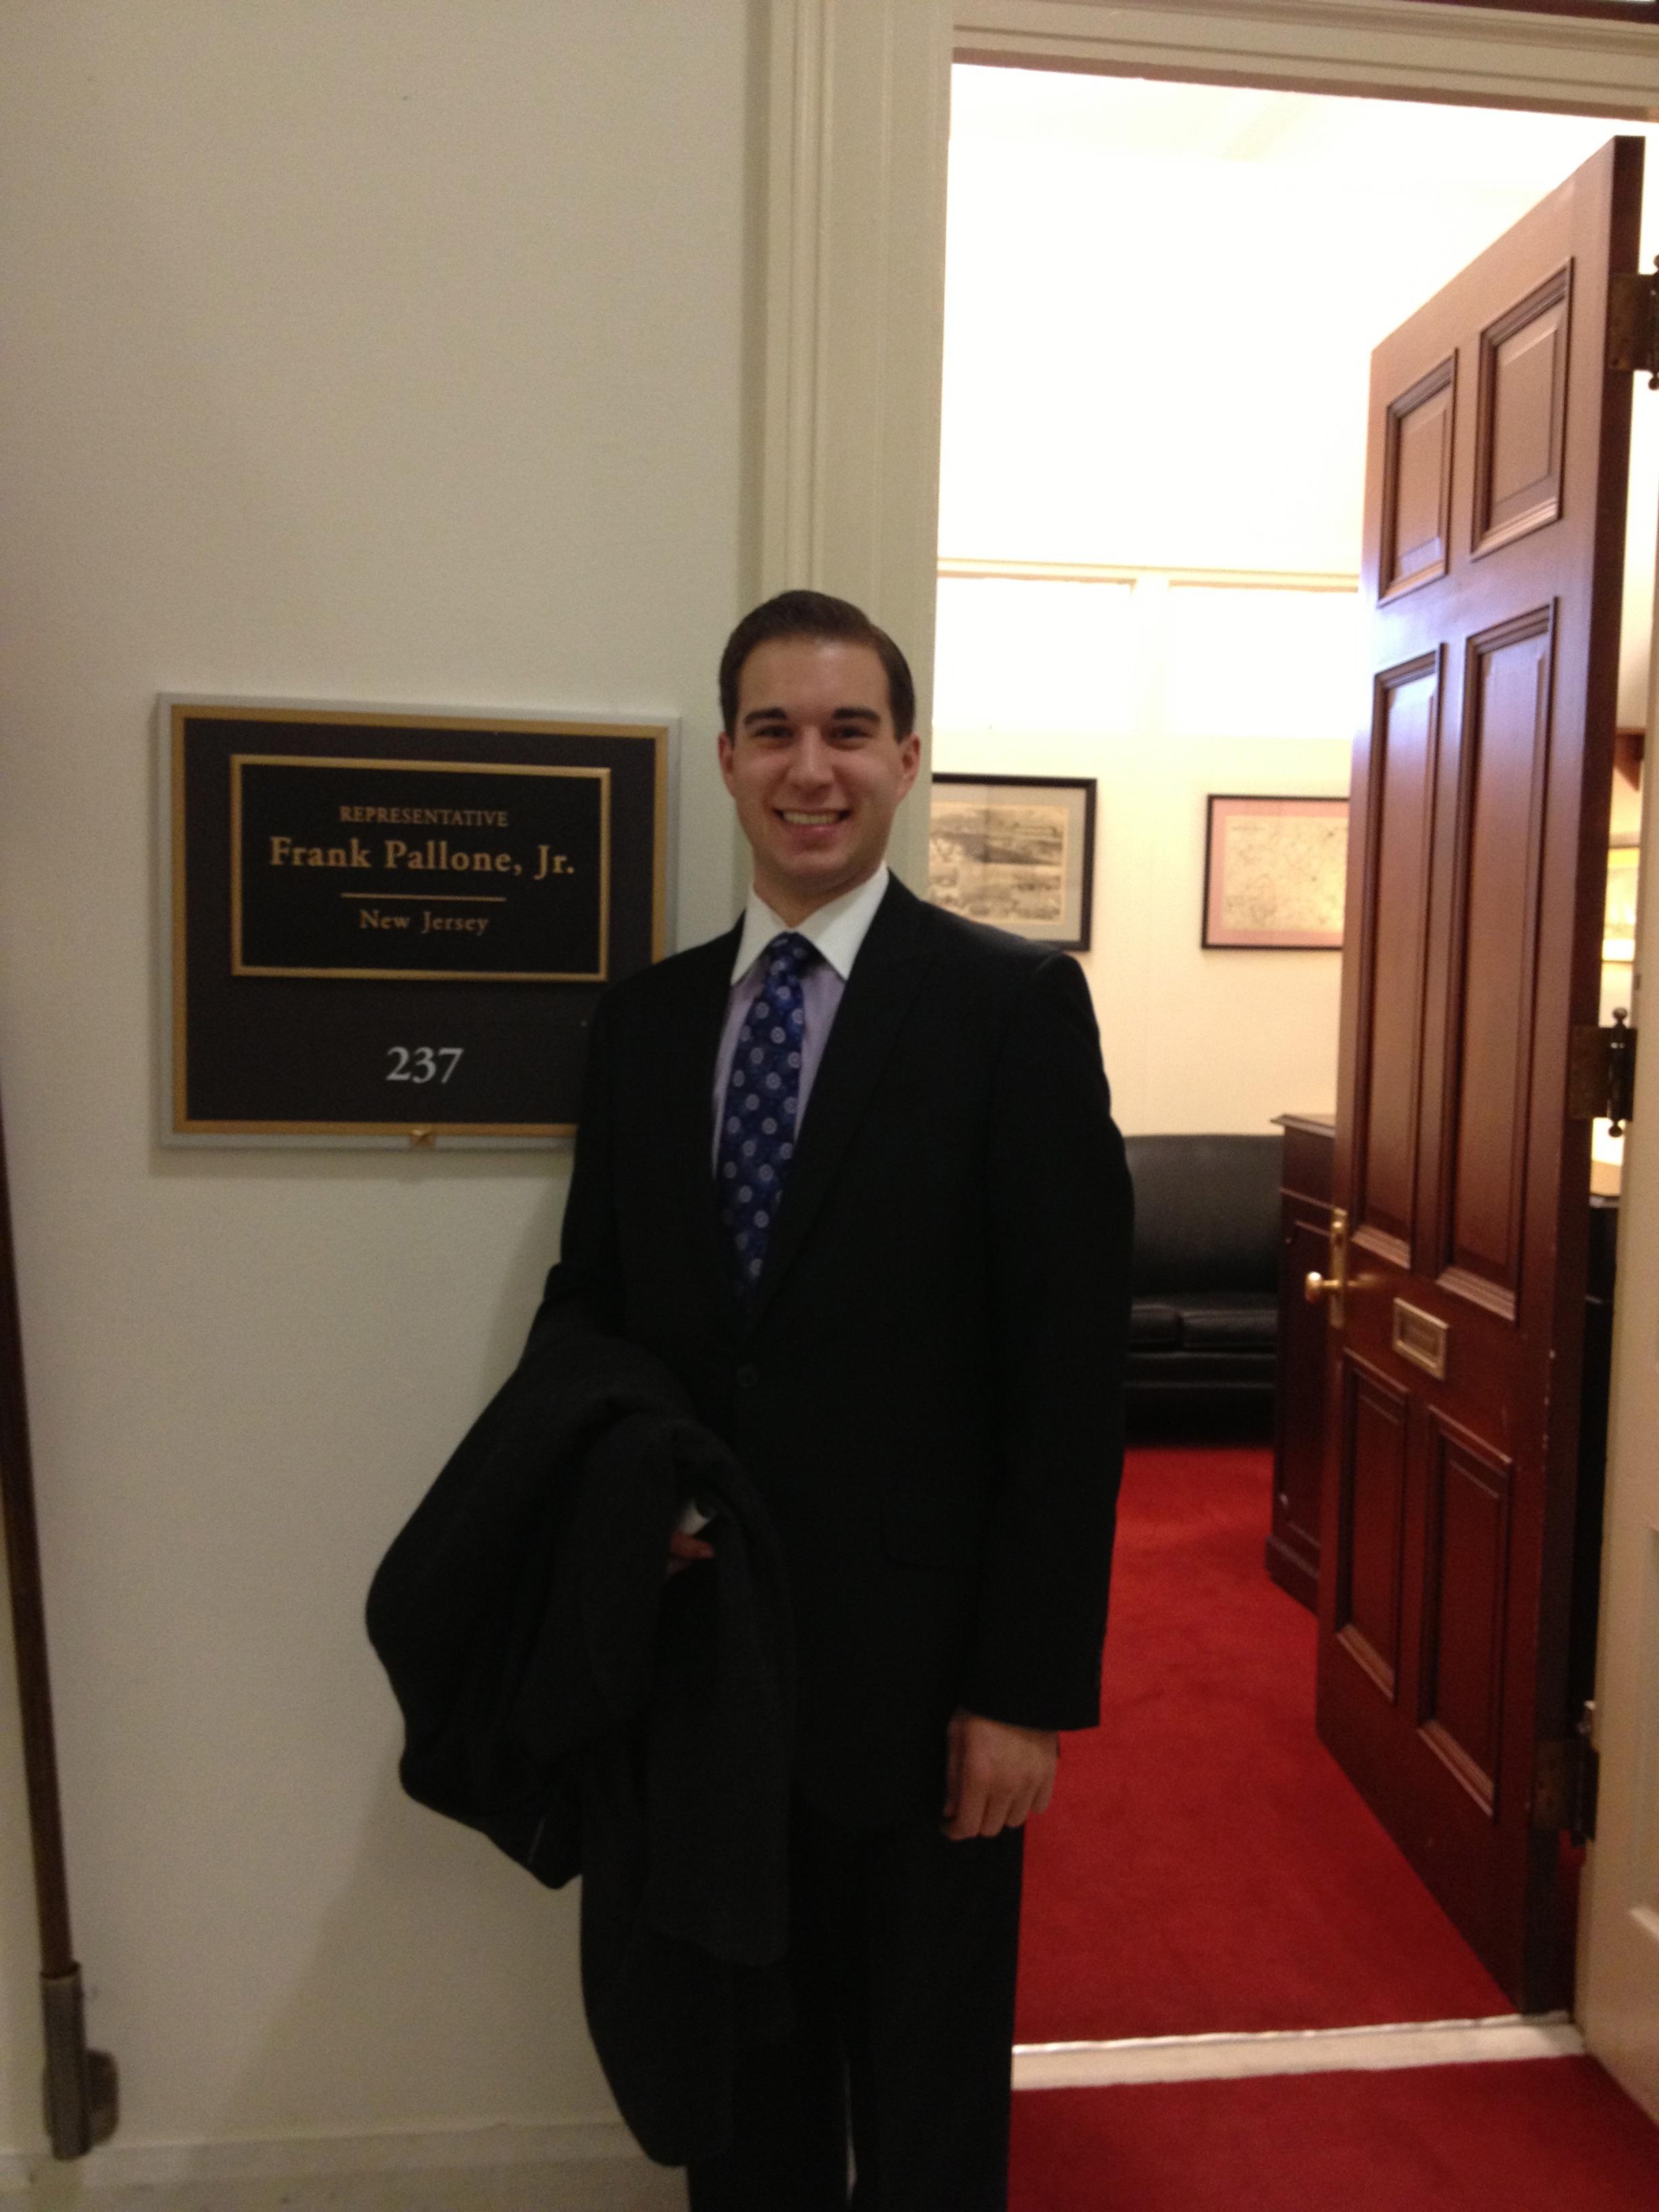 Office of Congressman Frank Pallone (D-NJ), July 2013